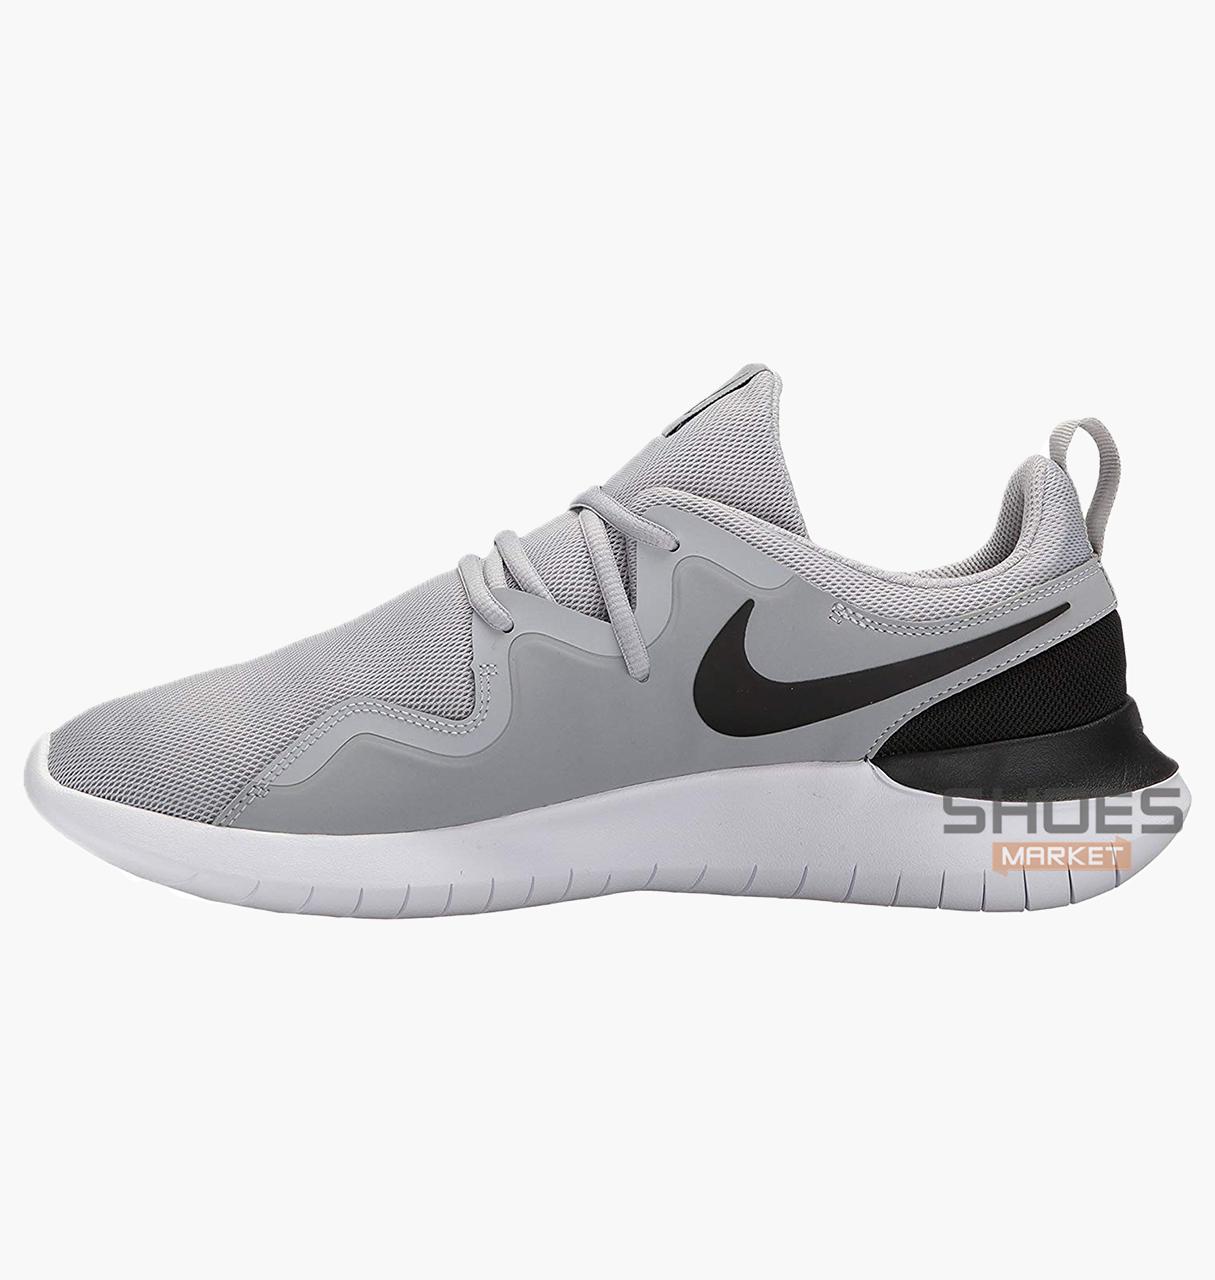 Мужские кроссовки Nike Tessen Grey AA2160-002, оригинал